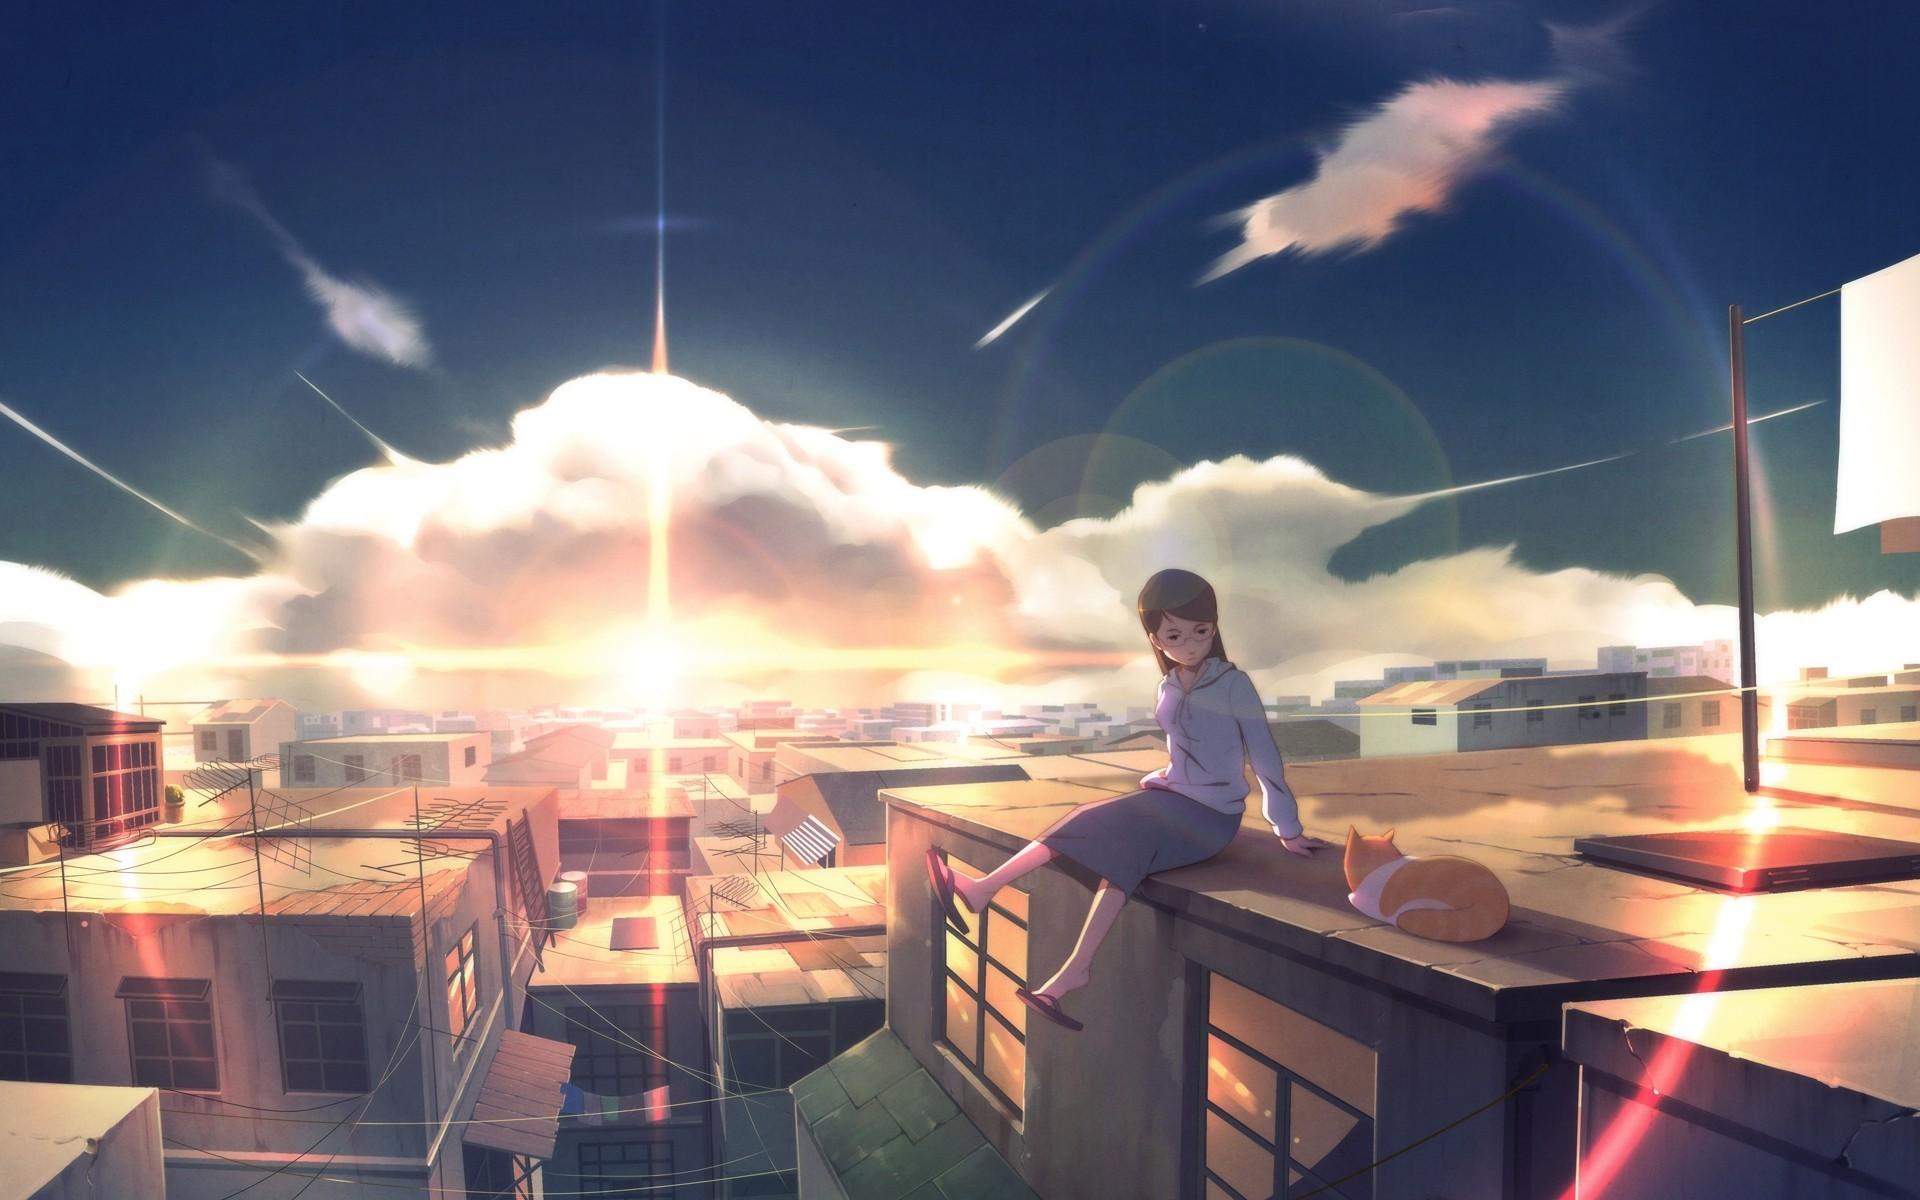 девушка крыша закат без смс